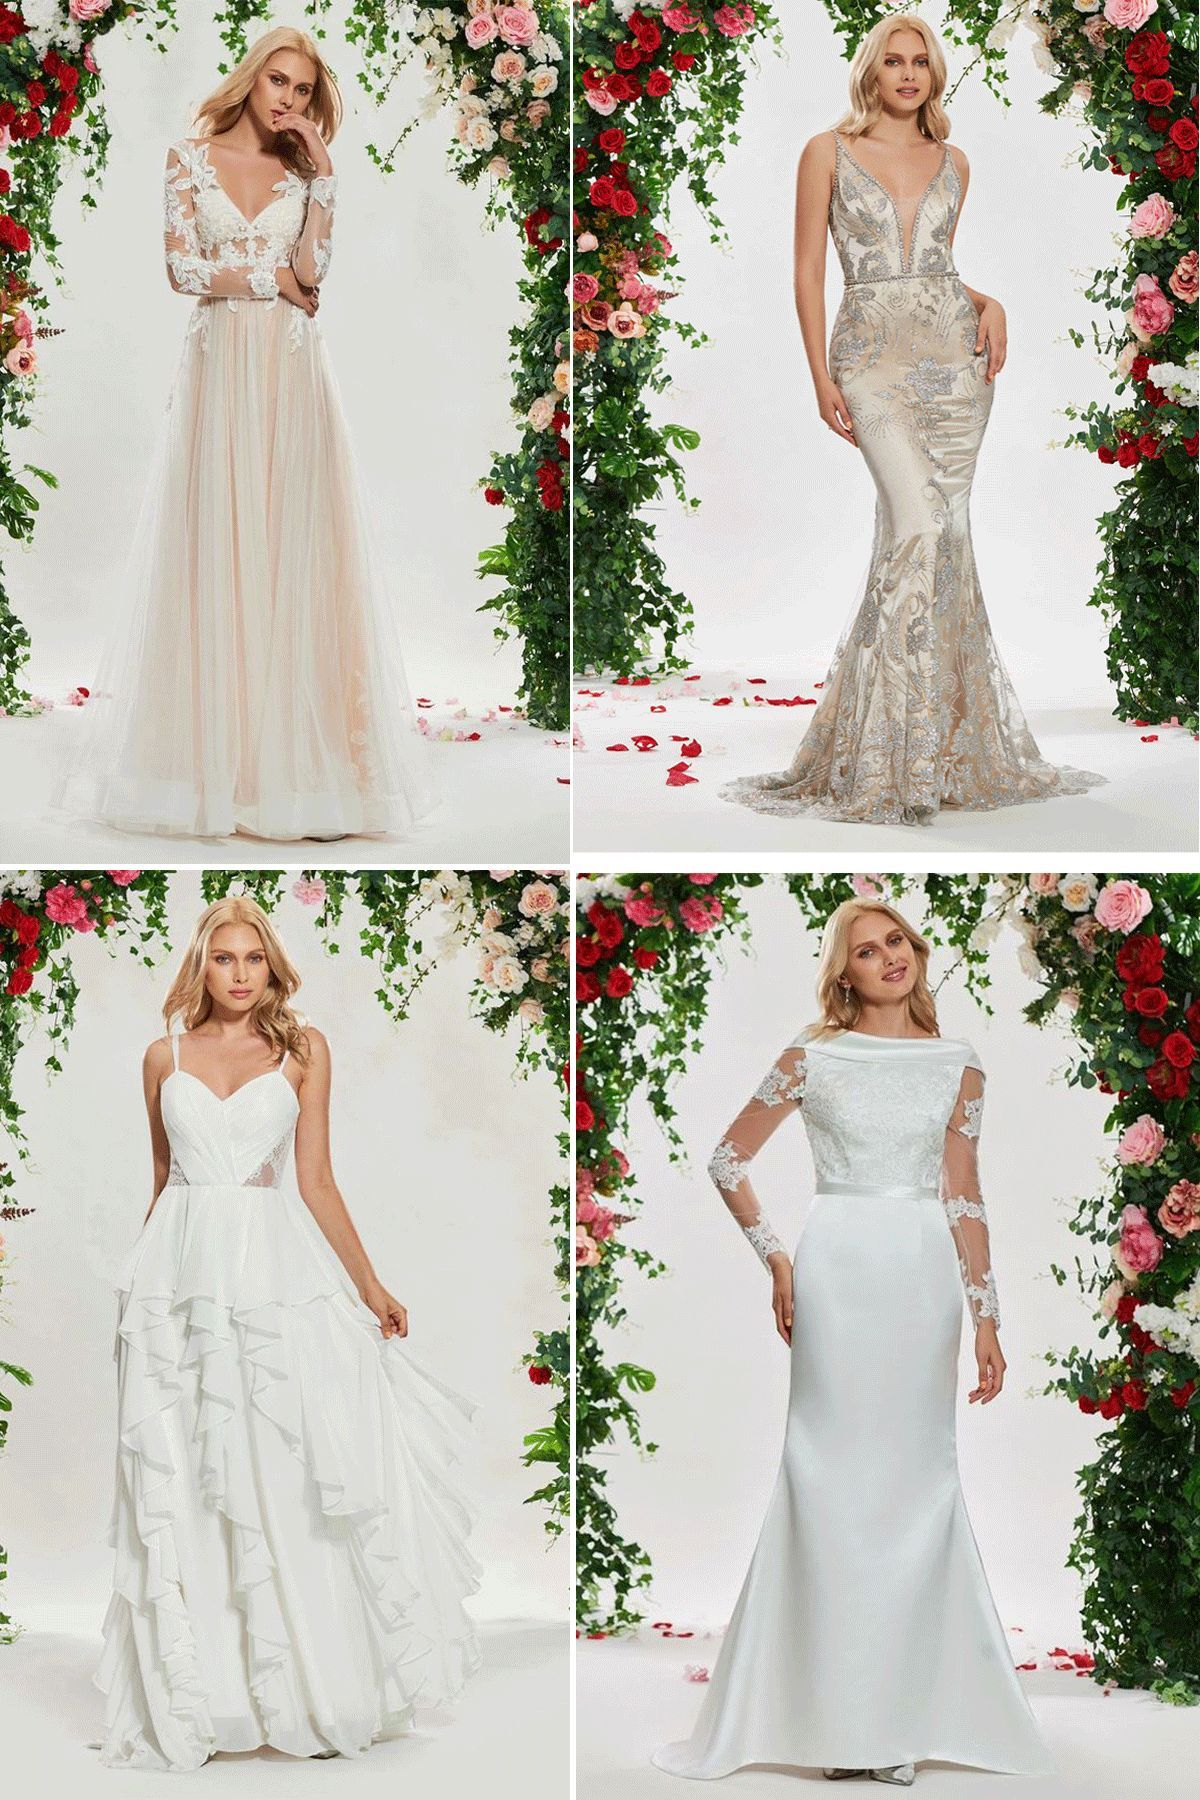 New wedding dress romantic and dreamyweddingbride wedding dress